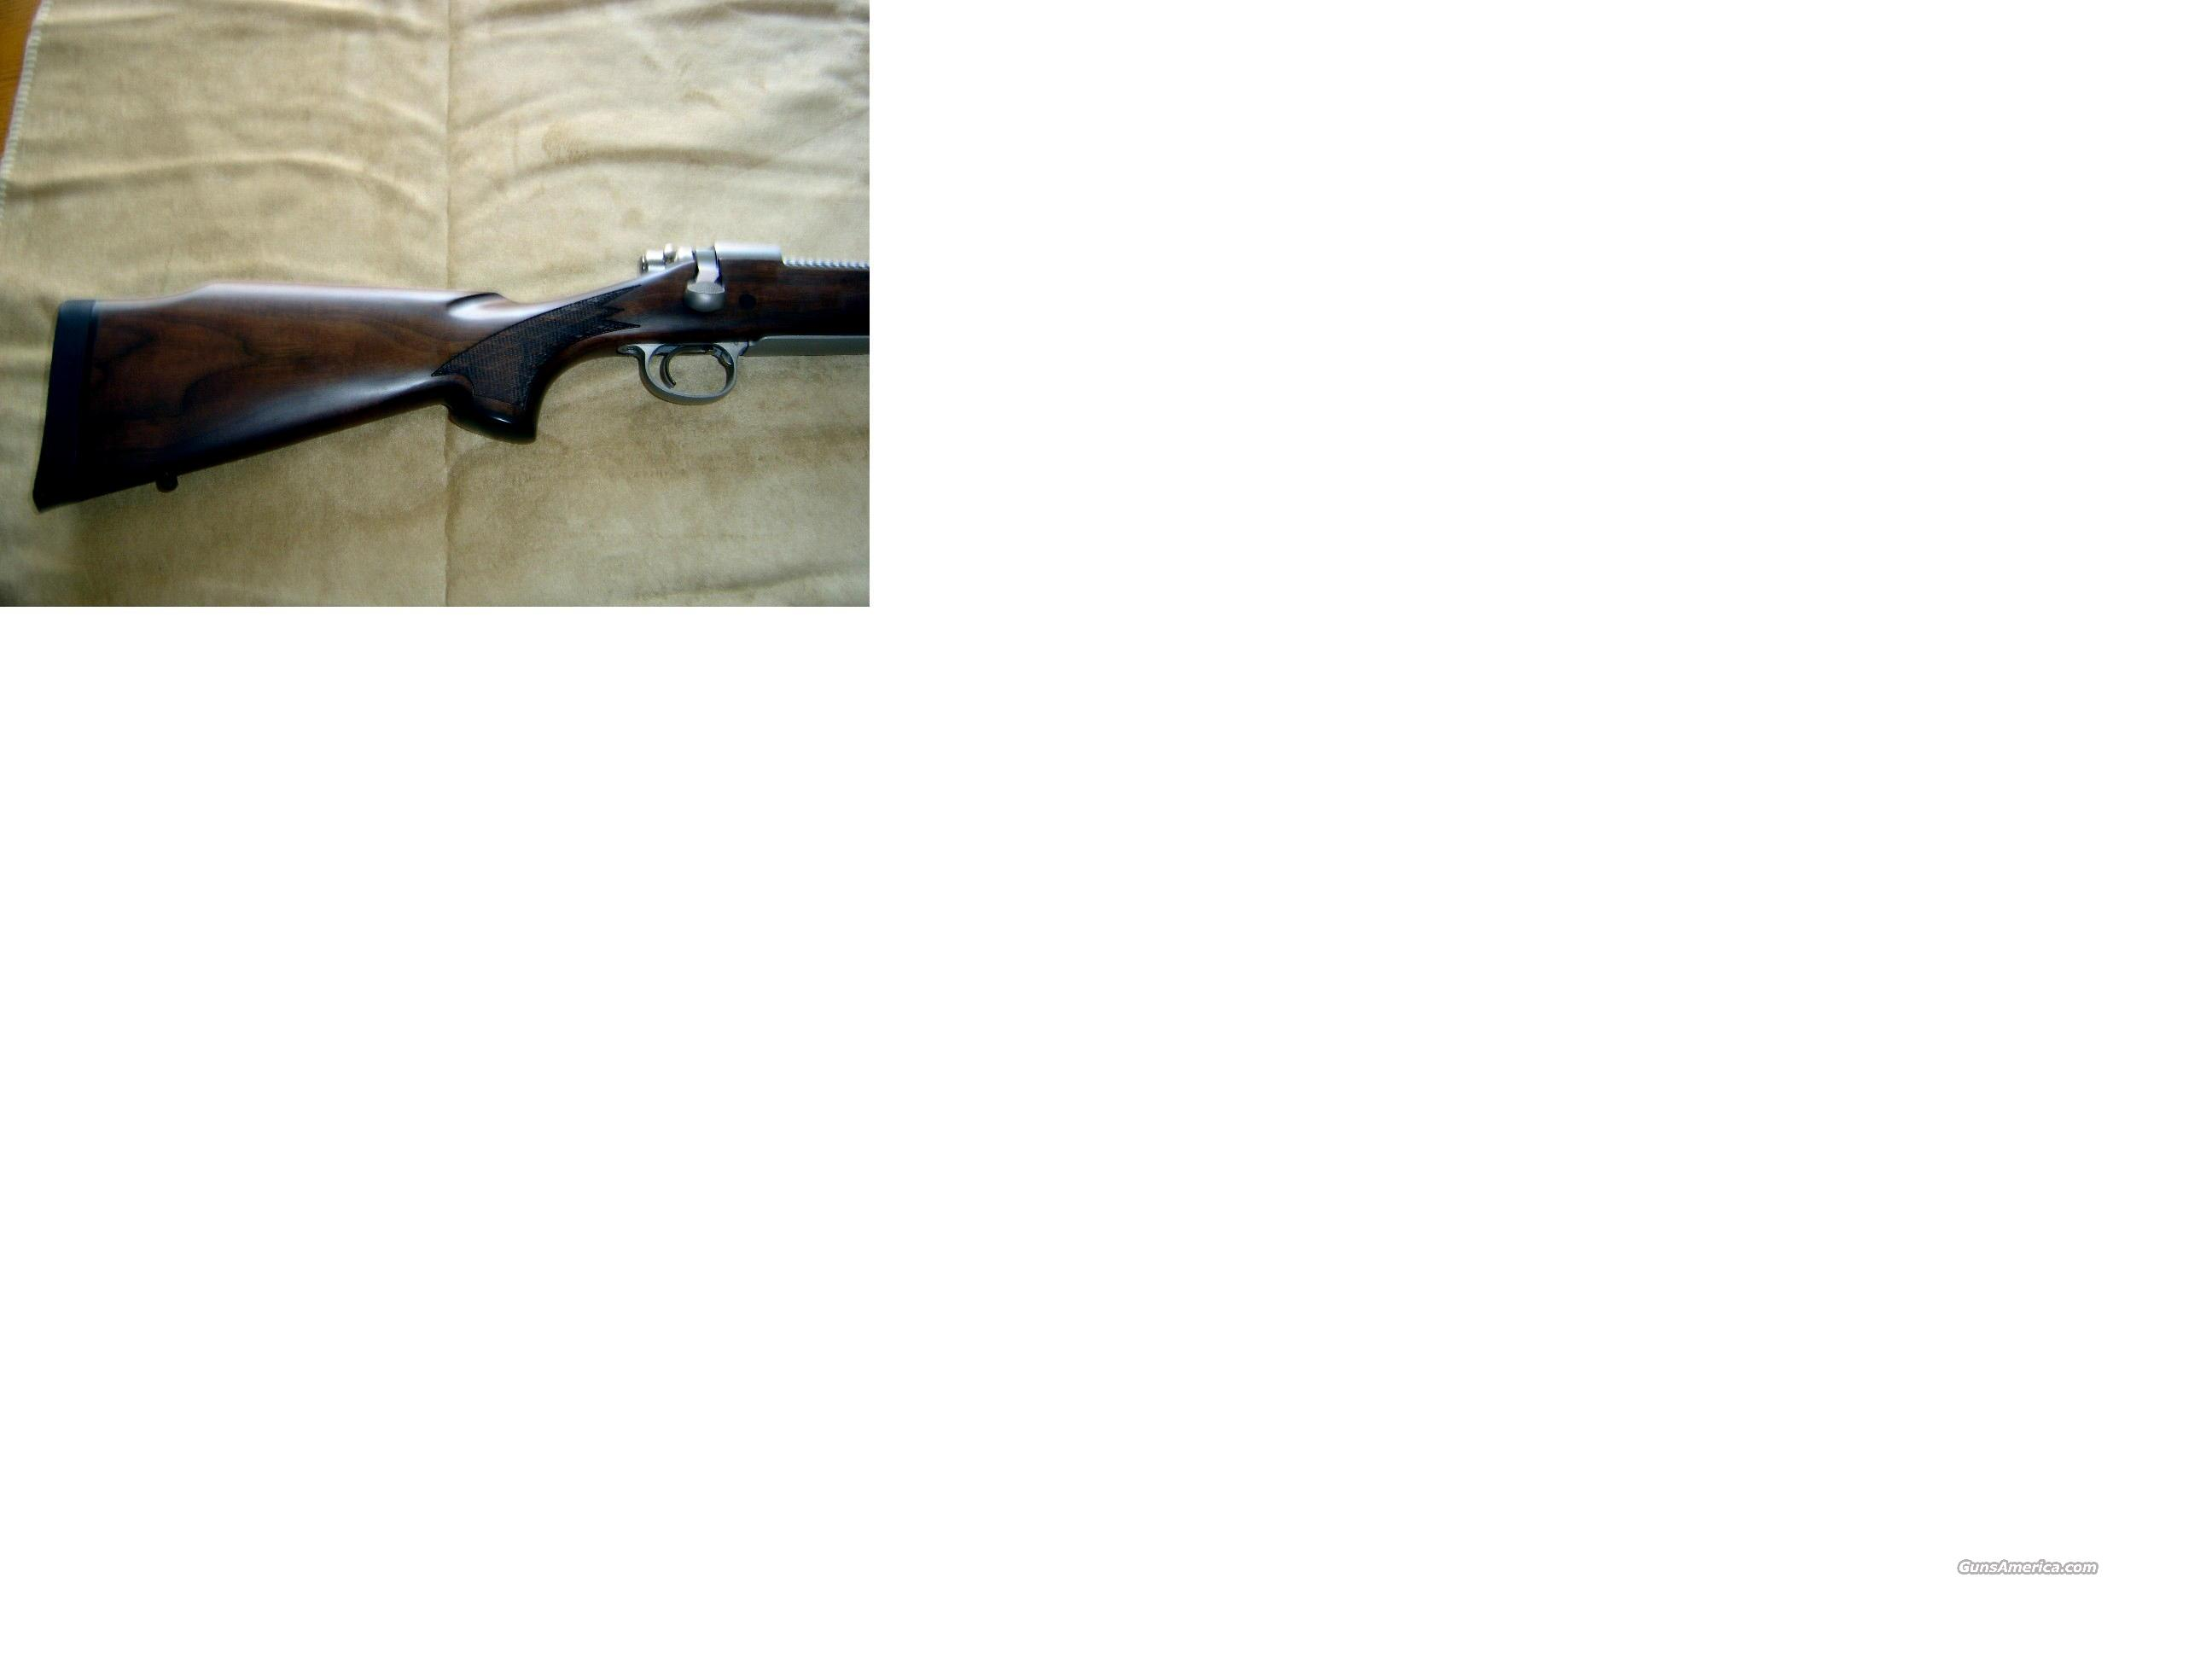 REMINGTON 700 BDL SPECIAL - 300 ULTRA MAG  Guns > Rifles > Remington Rifles - Modern > Model 700 > Sporting